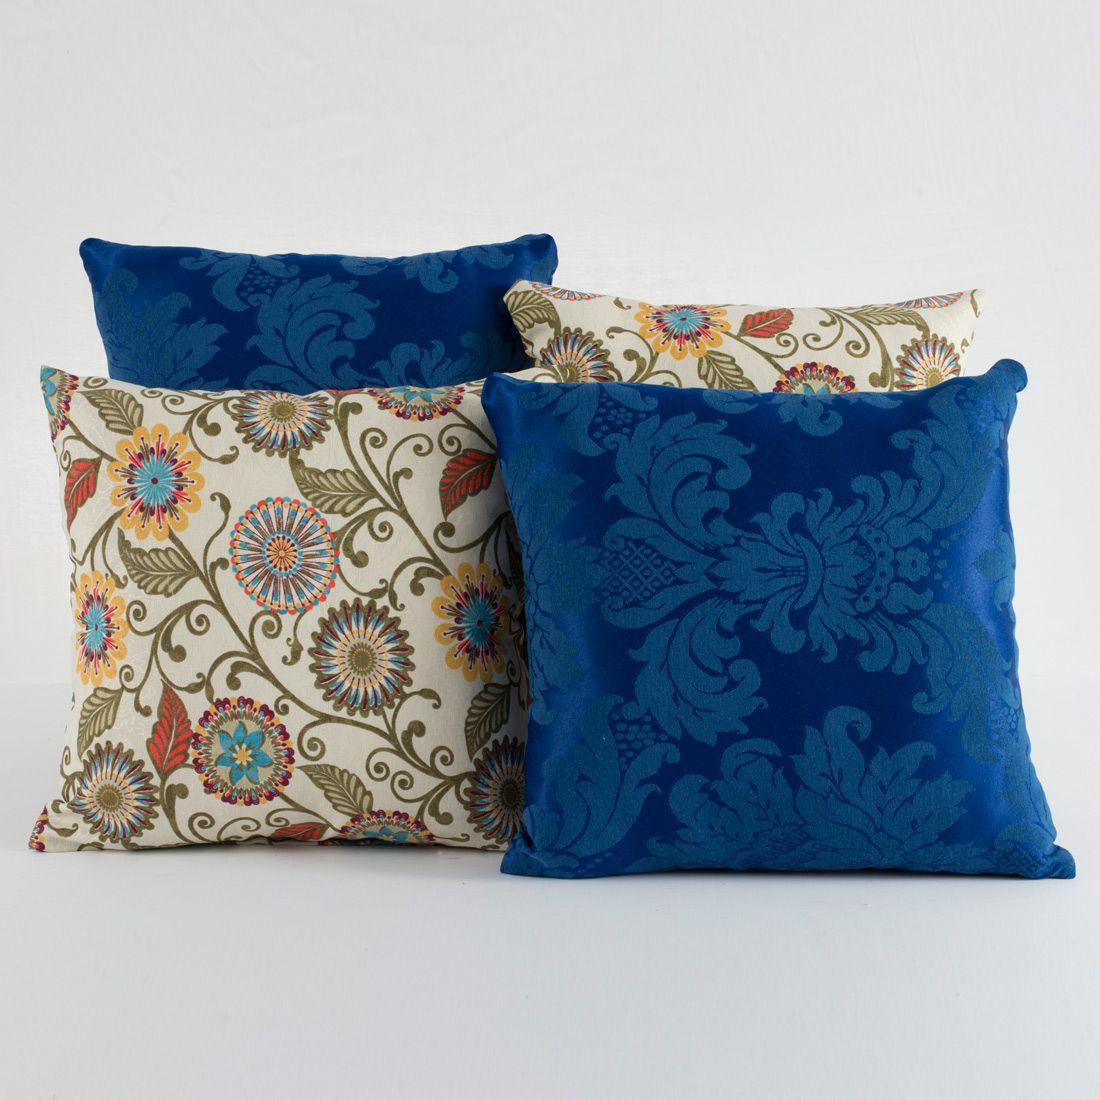 Kit c/ 4 Almofadas Cheias Decorativas Floral Azul Royal 04 Peças c/ Refil